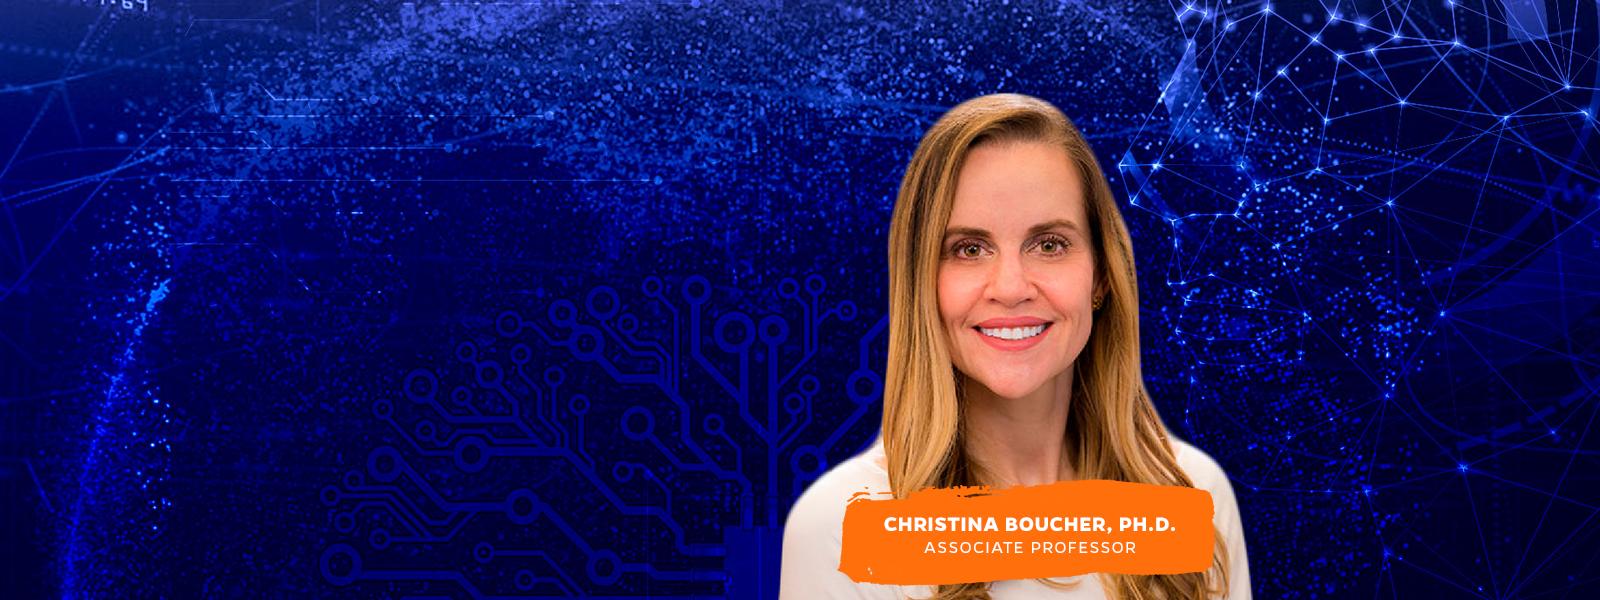 Christina Boucher, Ph.D.